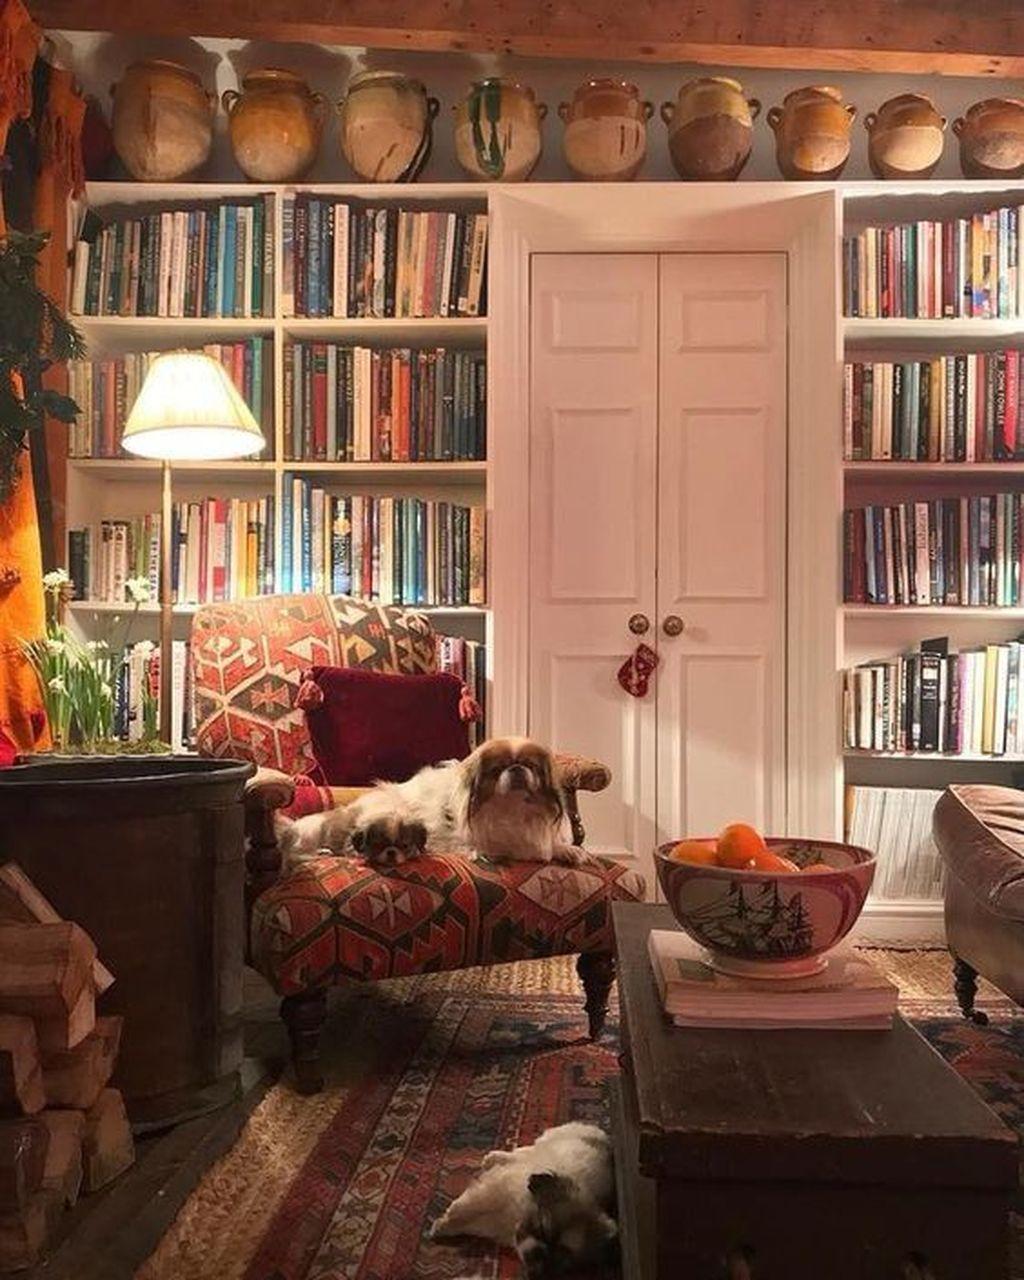 Cozy Study Room Ideas: 35 Astonishing Colorful Decor Ideas For Home